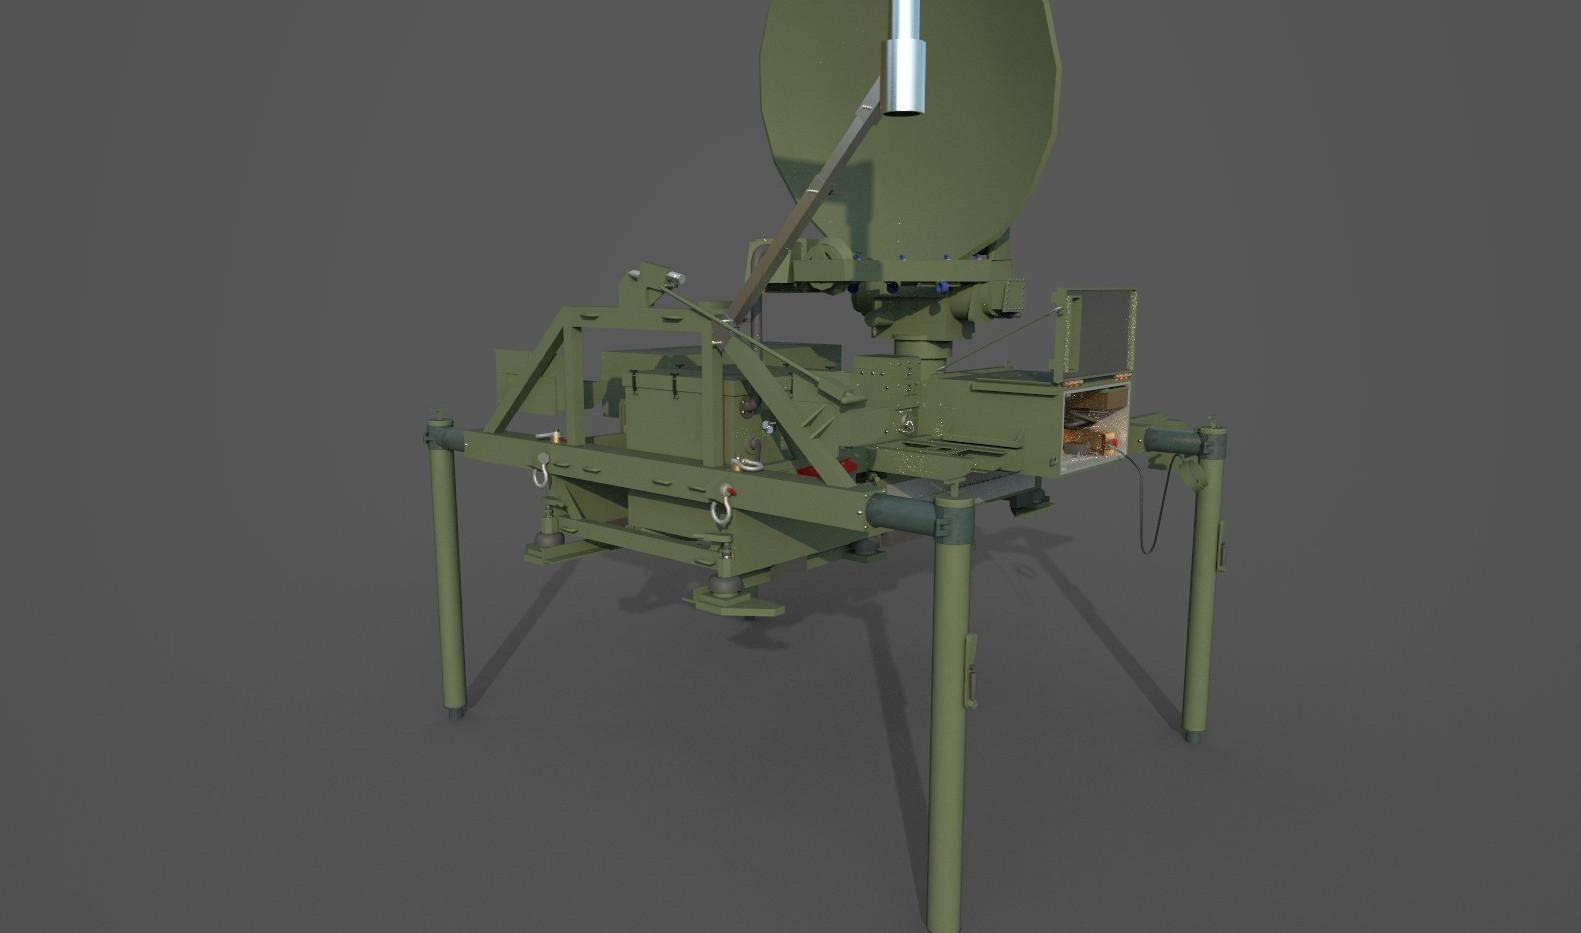 Smart-T Satellite Render 2.jpg